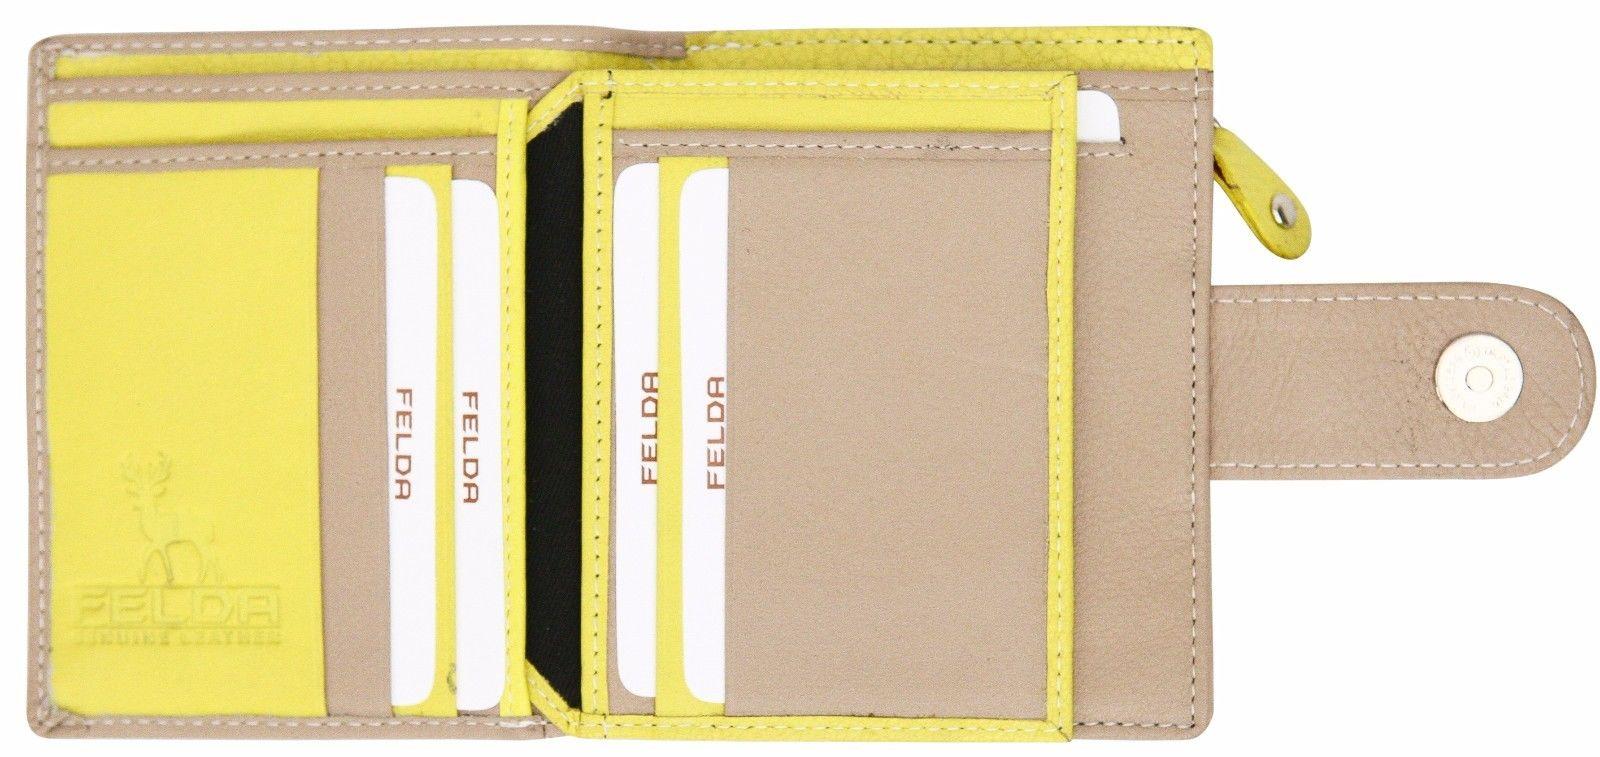 Felda-RFID-onorevoli-MEDAGLIA-amp-Card-Purse-Wallet-Genuine-Leather-Multi-SOFT-BOX-REGALO miniatura 62